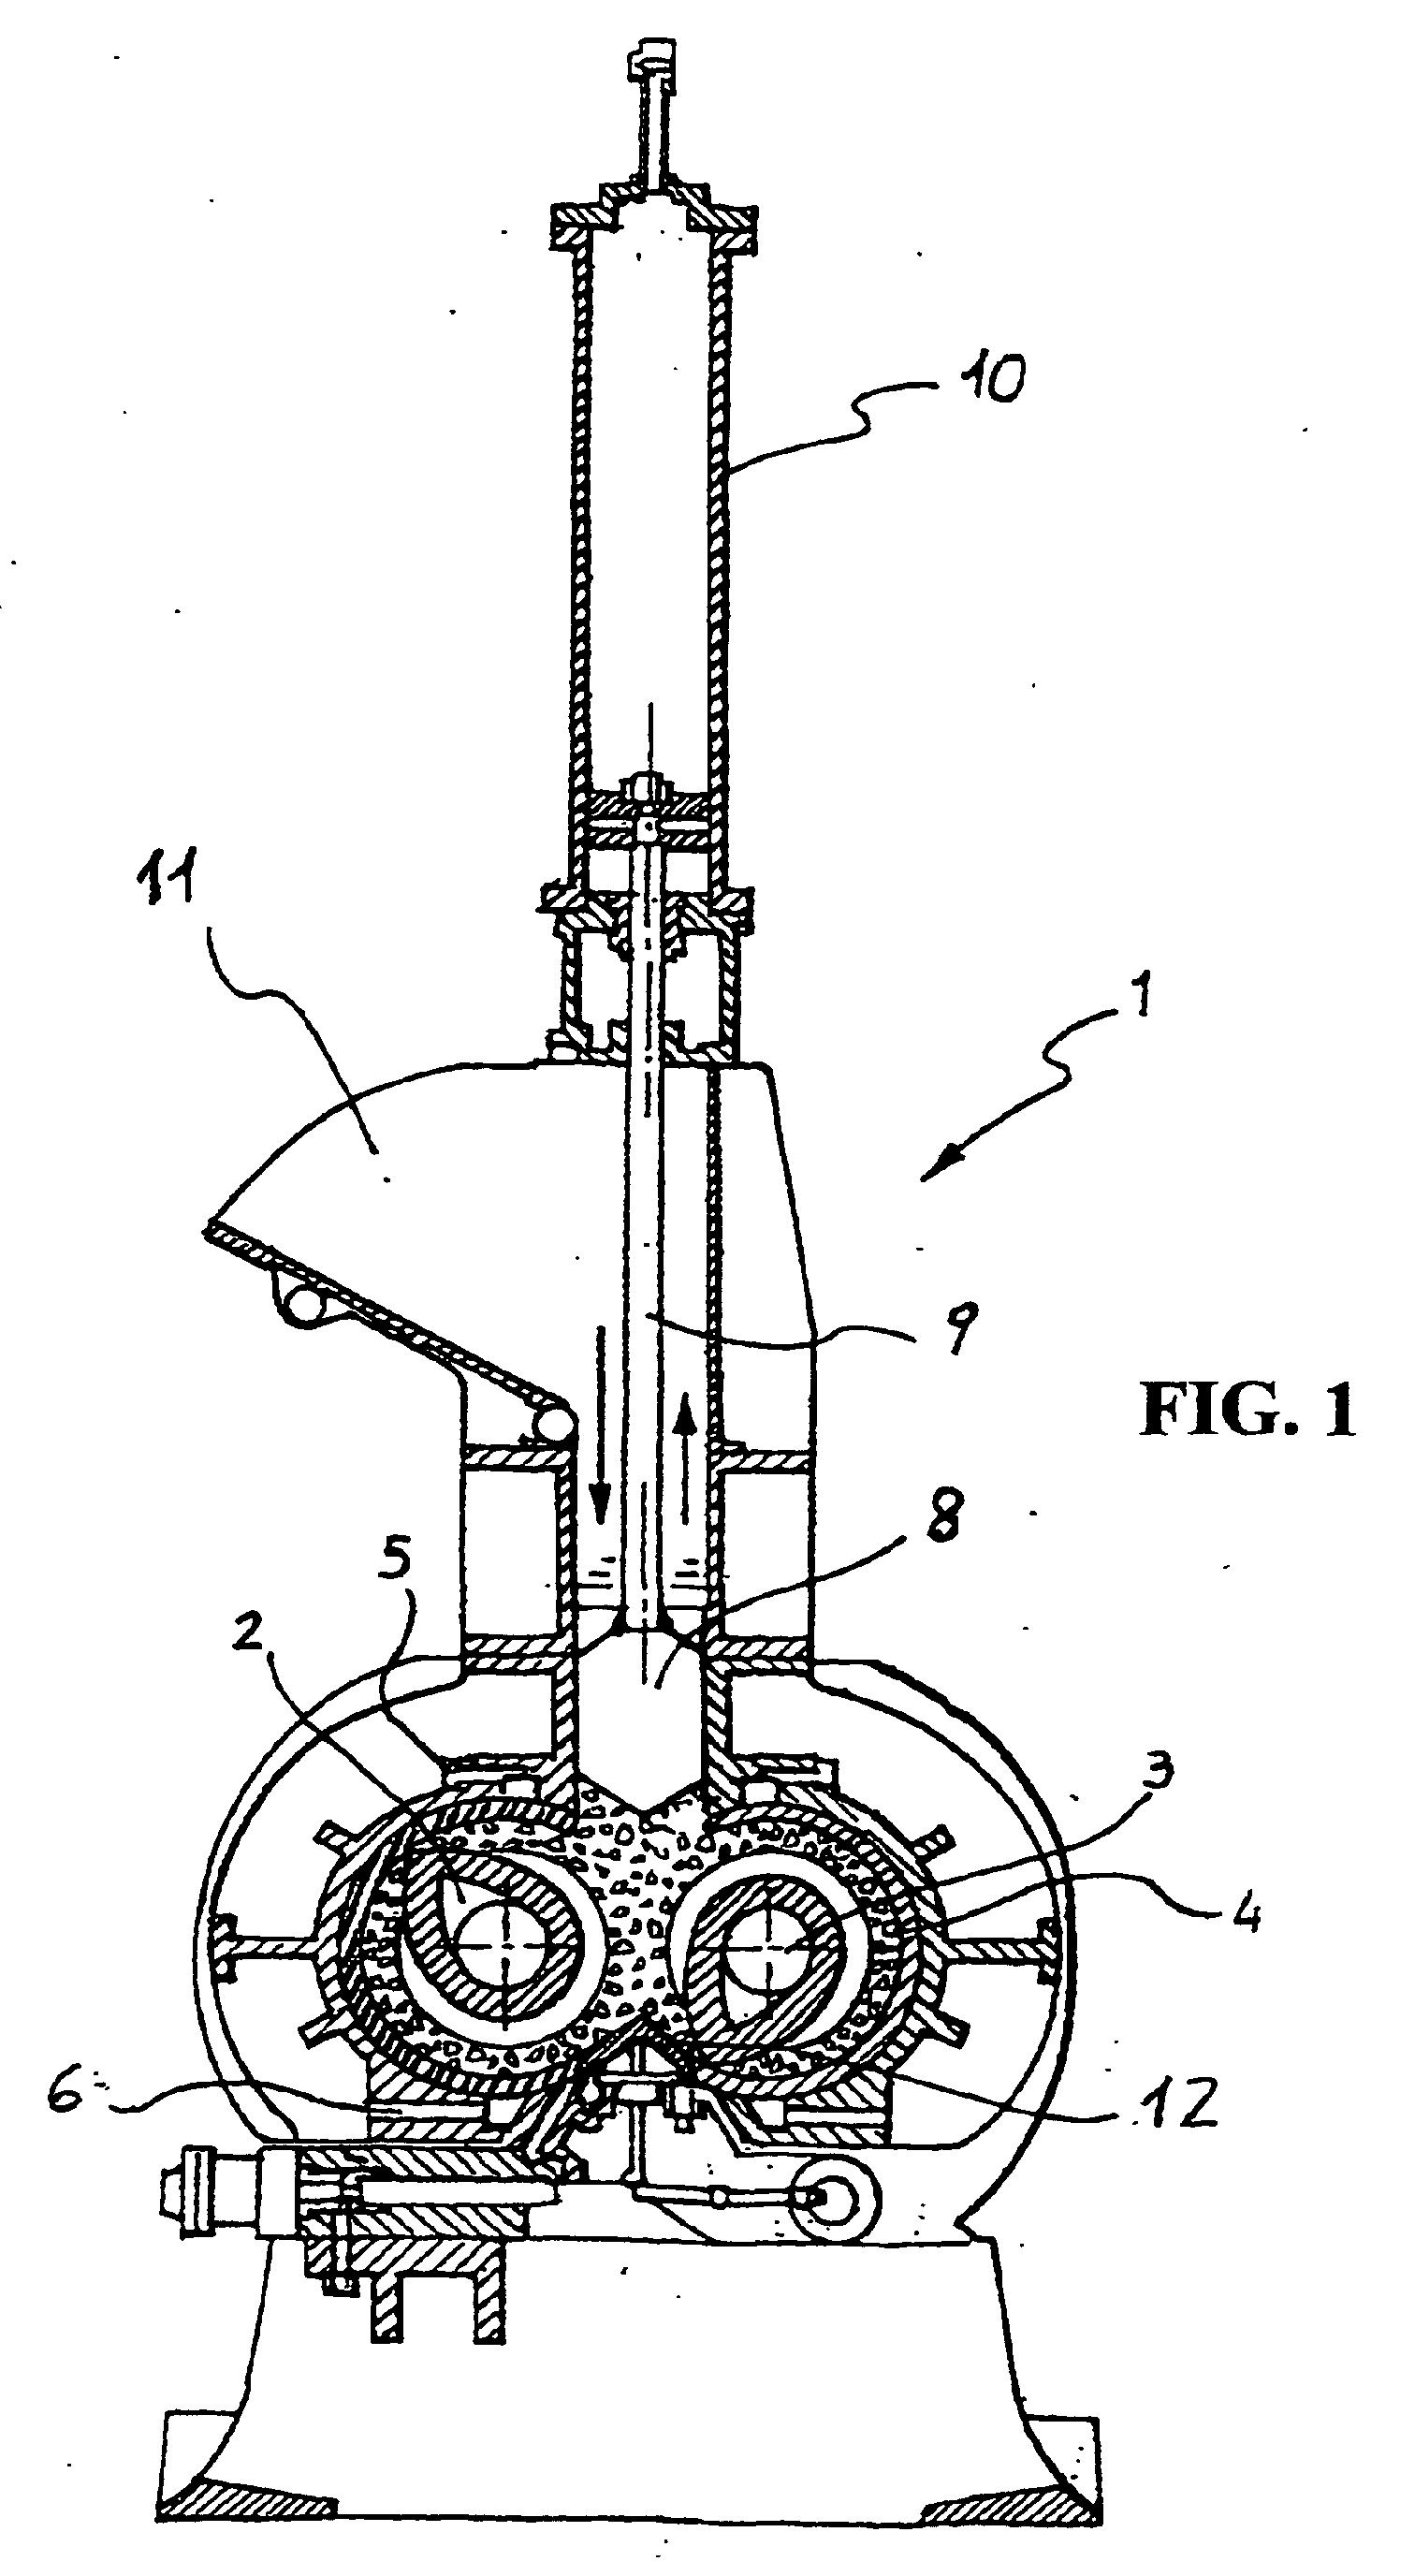 patent ep1201387b1